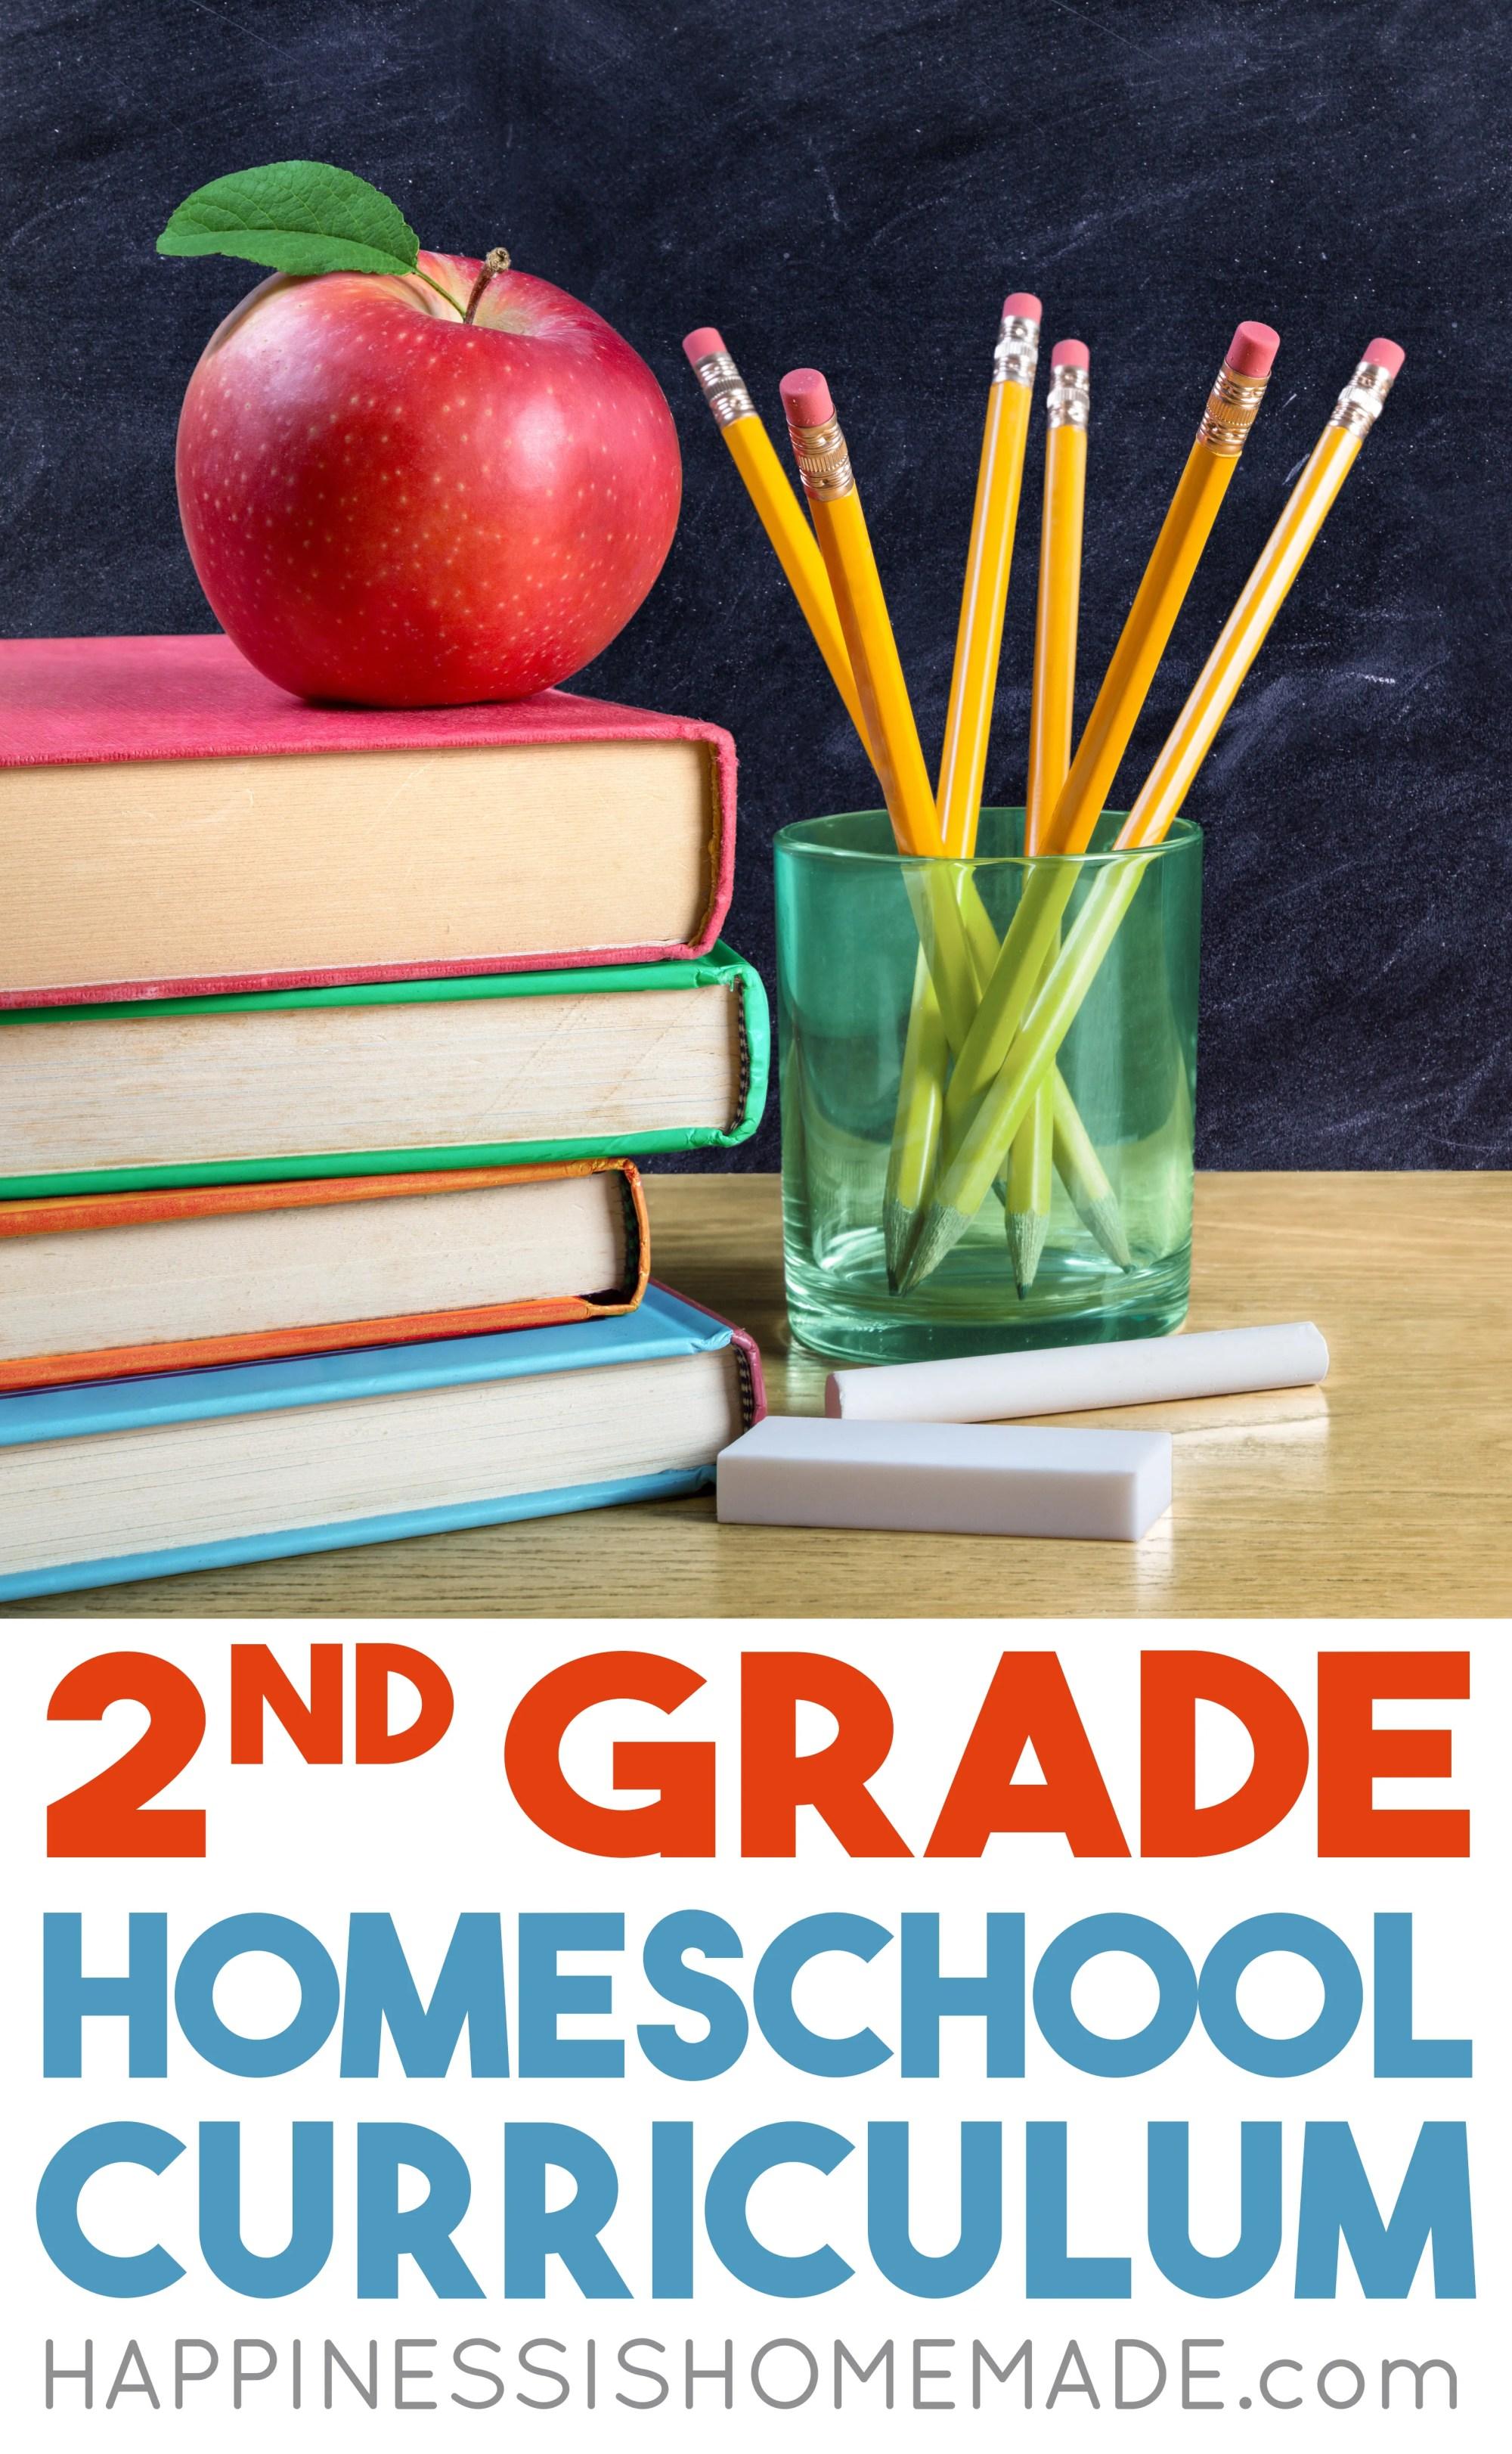 hight resolution of Homeschool Curriculum - 2nd Grade - Happiness is Homemade